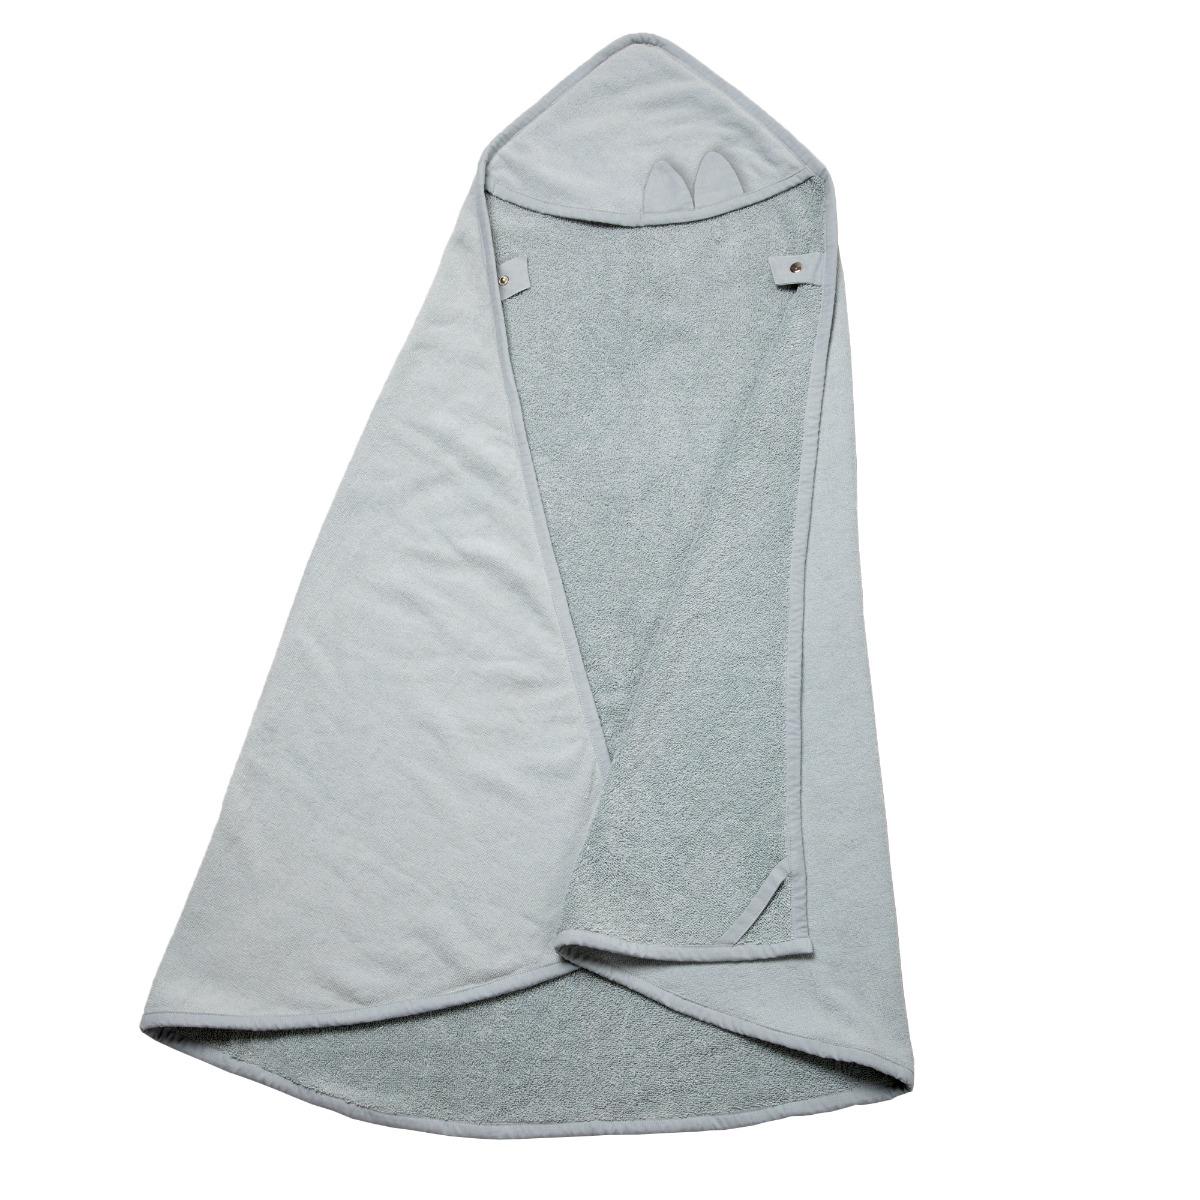 Fabelab Hooded Towel Cape Cat